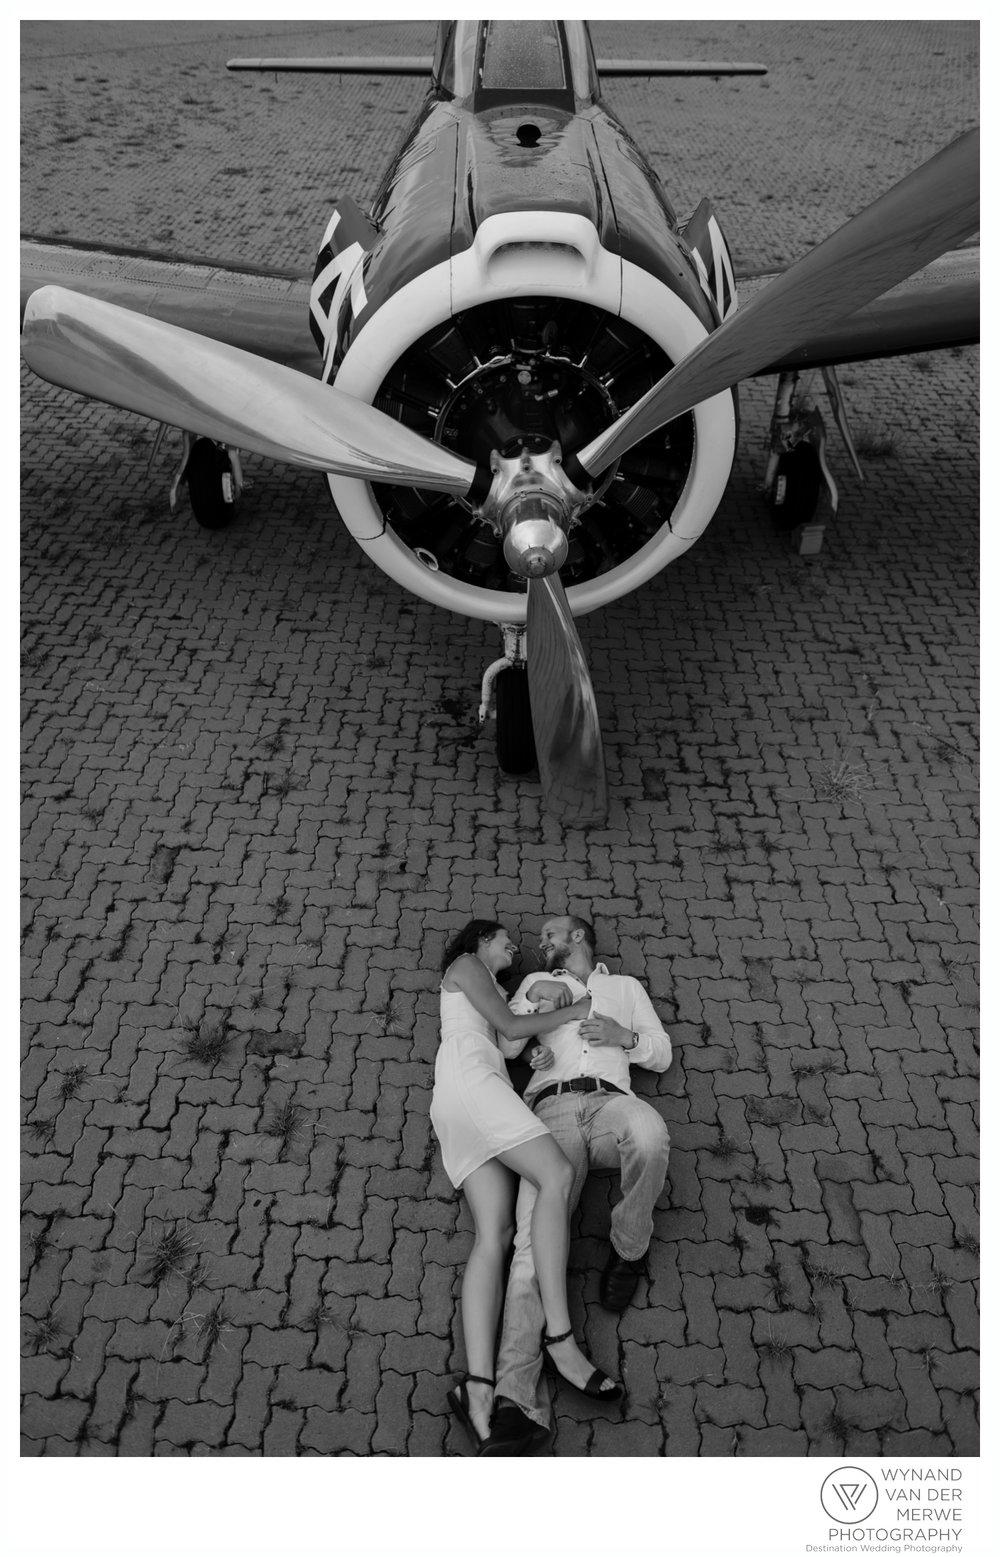 WynandvanderMerwe_weddingphotography_engagementshoot_wonderboomairport_aeroplane_klaasjanmareli_gauteng_2018-108.jpg